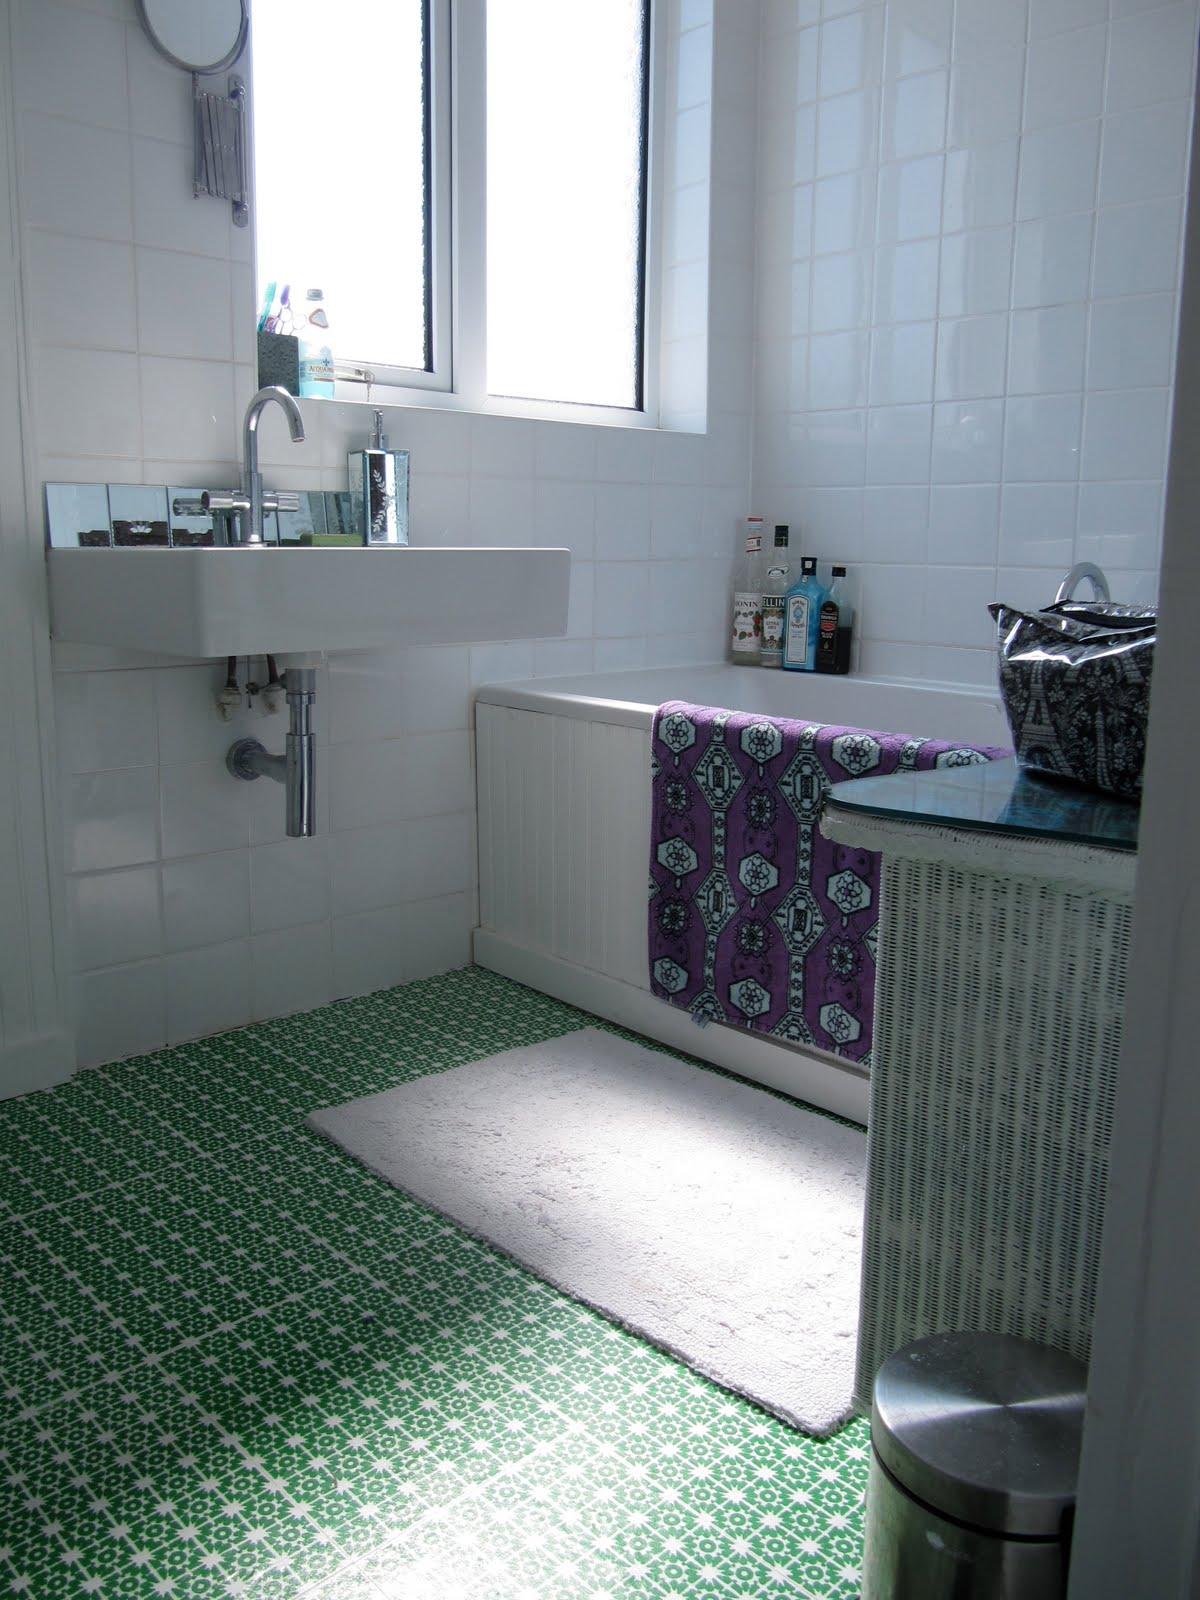 how to stop waterflow on bathroom floor